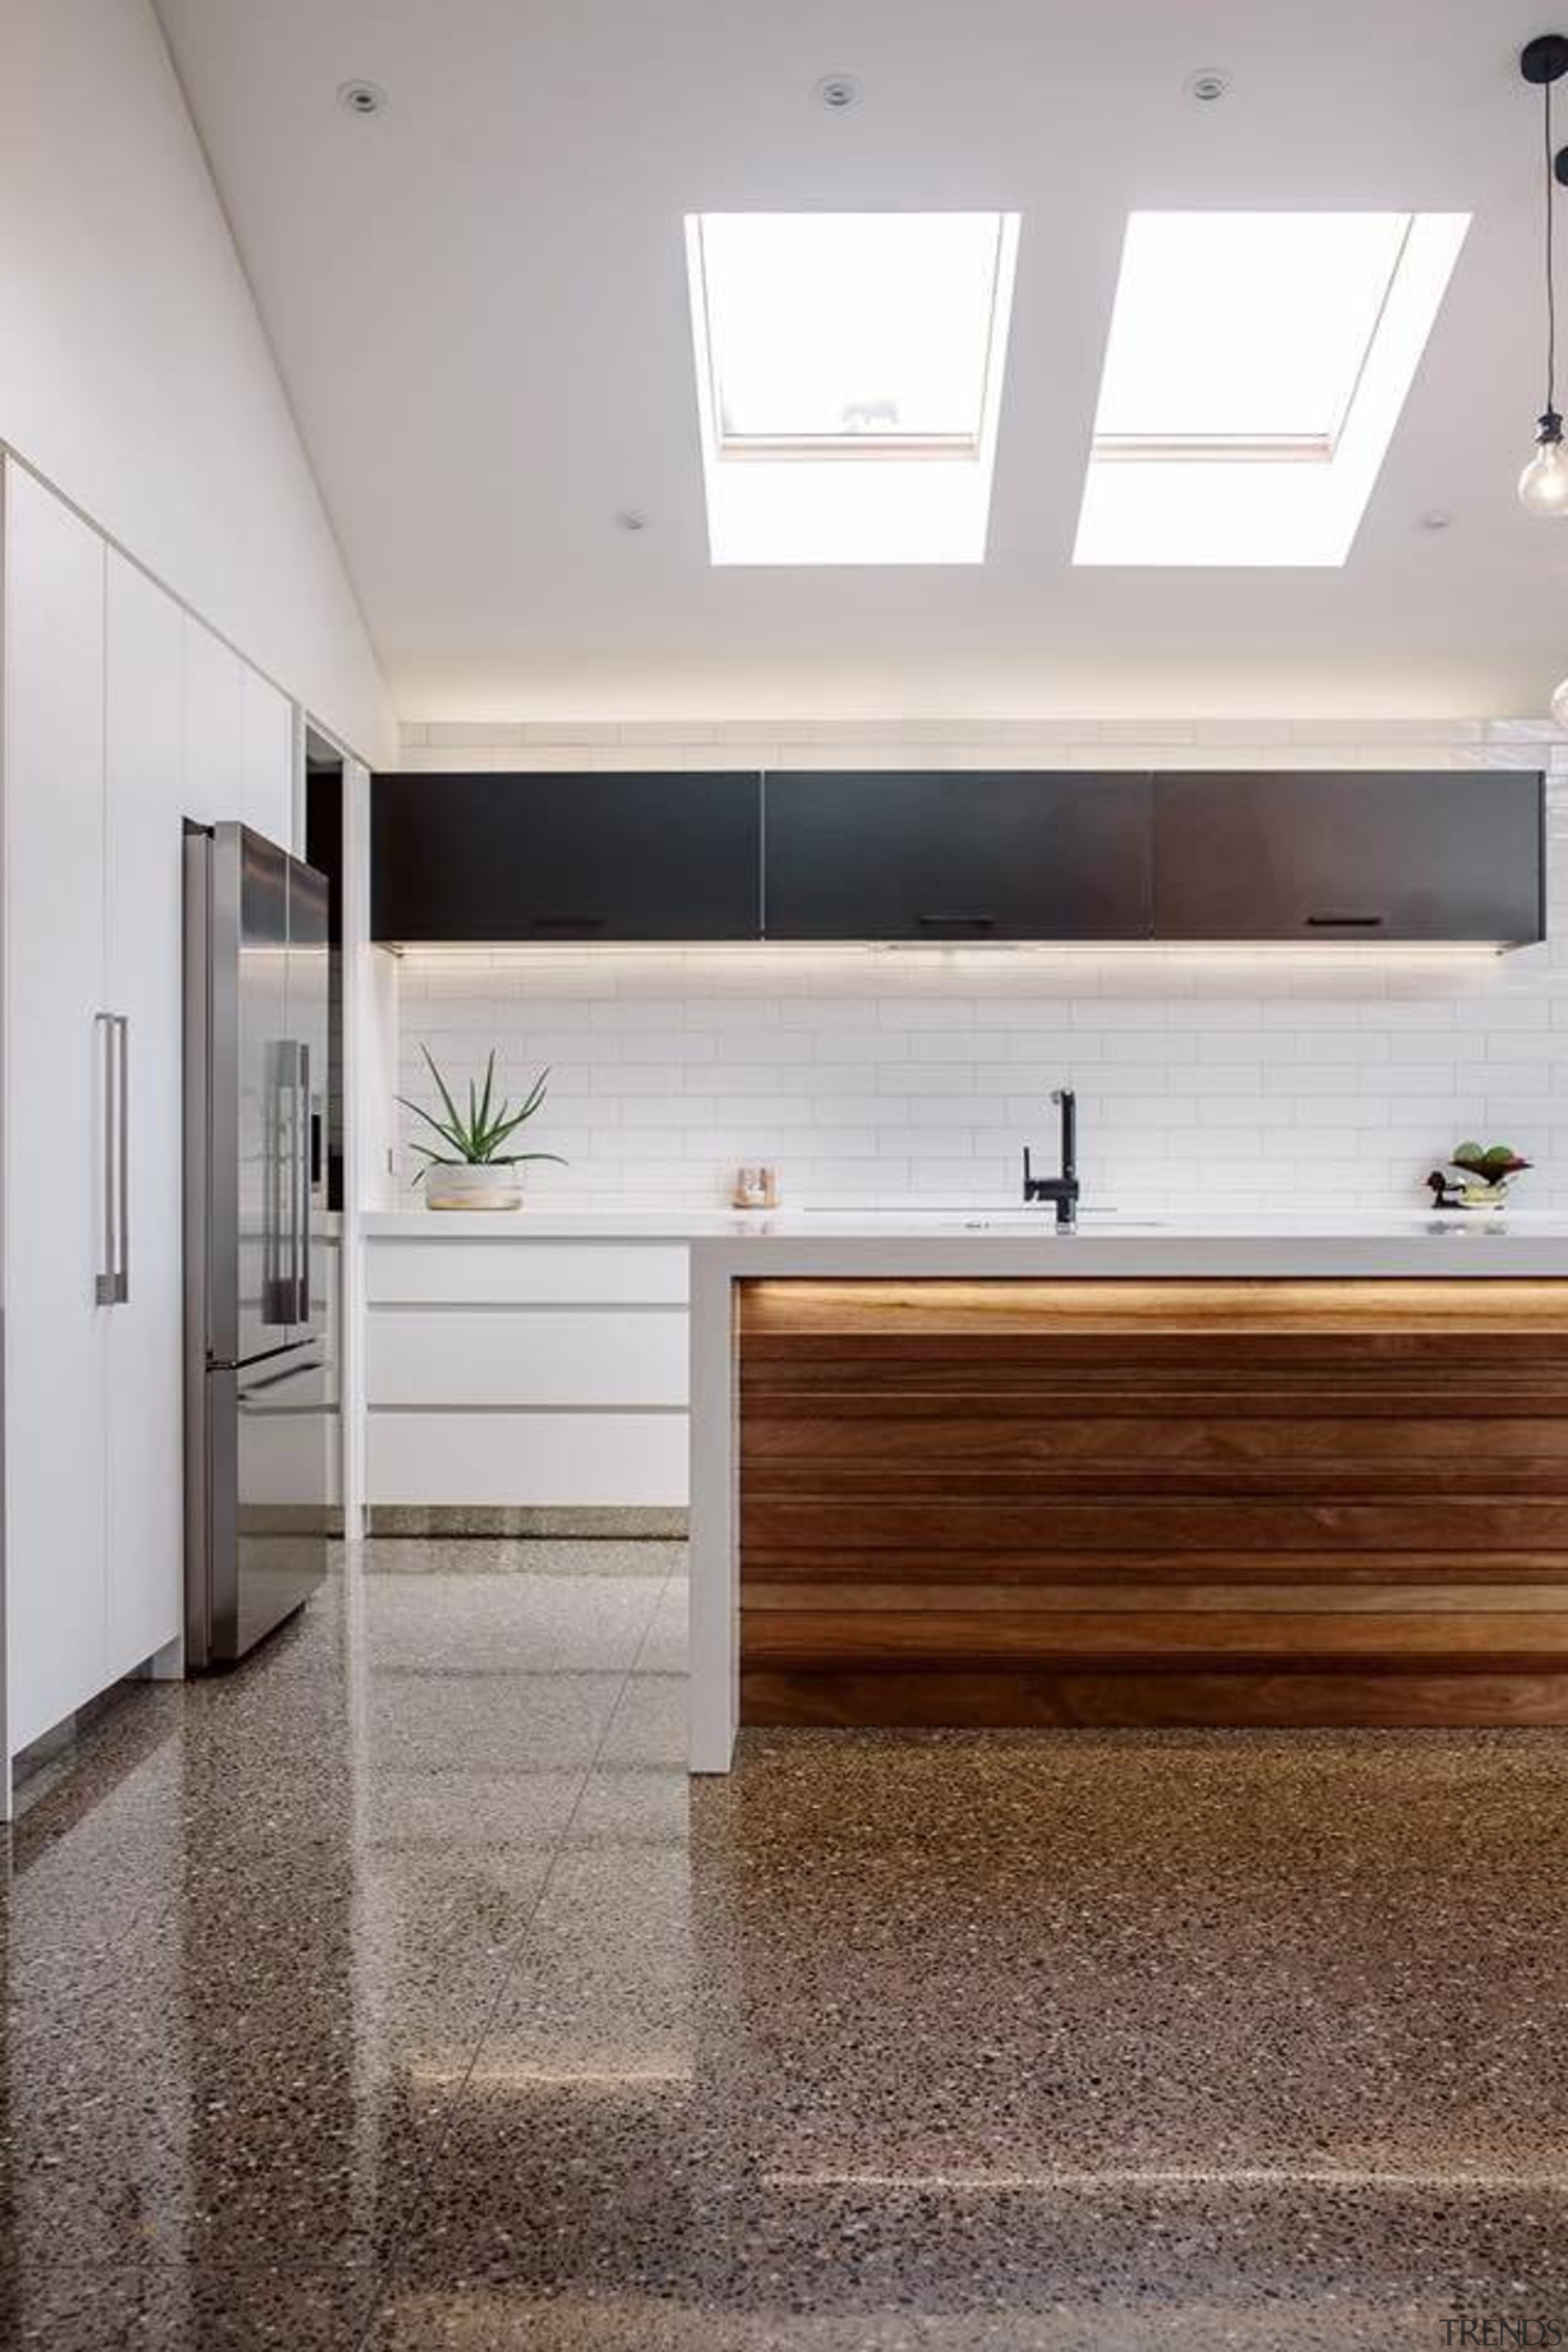 Rowson Kitchen & Joinery - Rowson Kitchen & ceiling, daylighting, floor, flooring, home, interior design, laminate flooring, real estate, wood flooring, gray